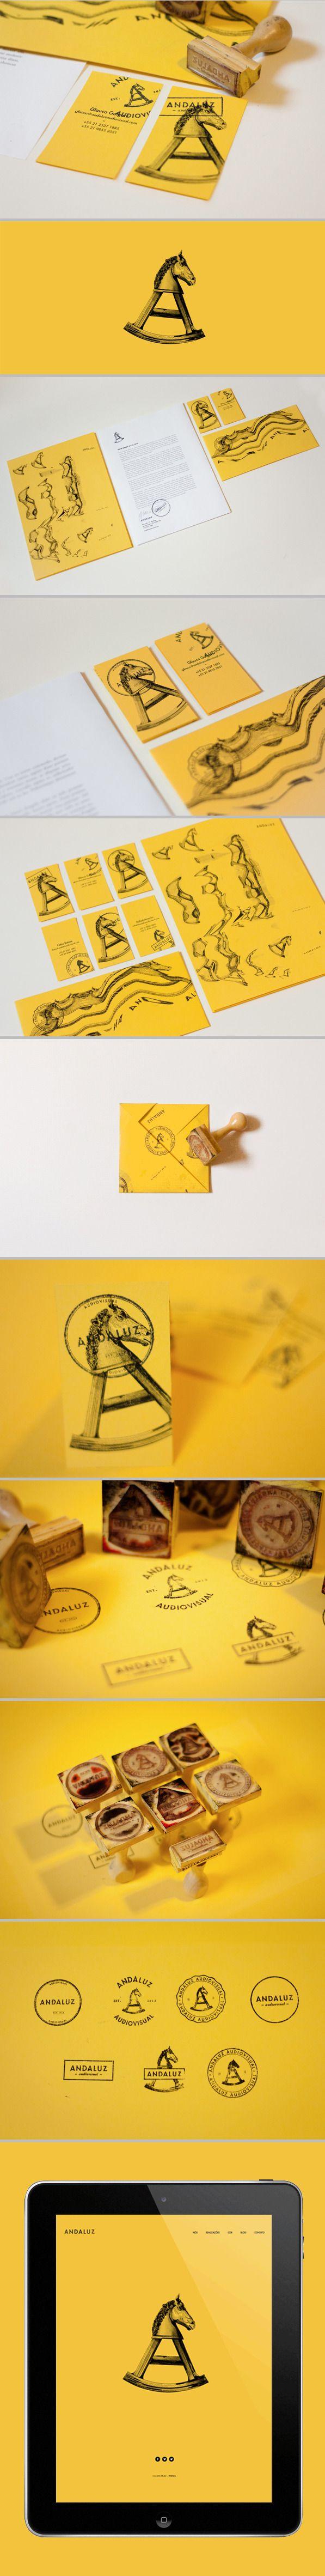 Andaluz identity by Plau | #stationary #corporate #design #corporatedesign #identity #branding #marketing < repinned by www.BlickeDeeler.de | Take a look at www.LogoGestaltung-Hamburg.de